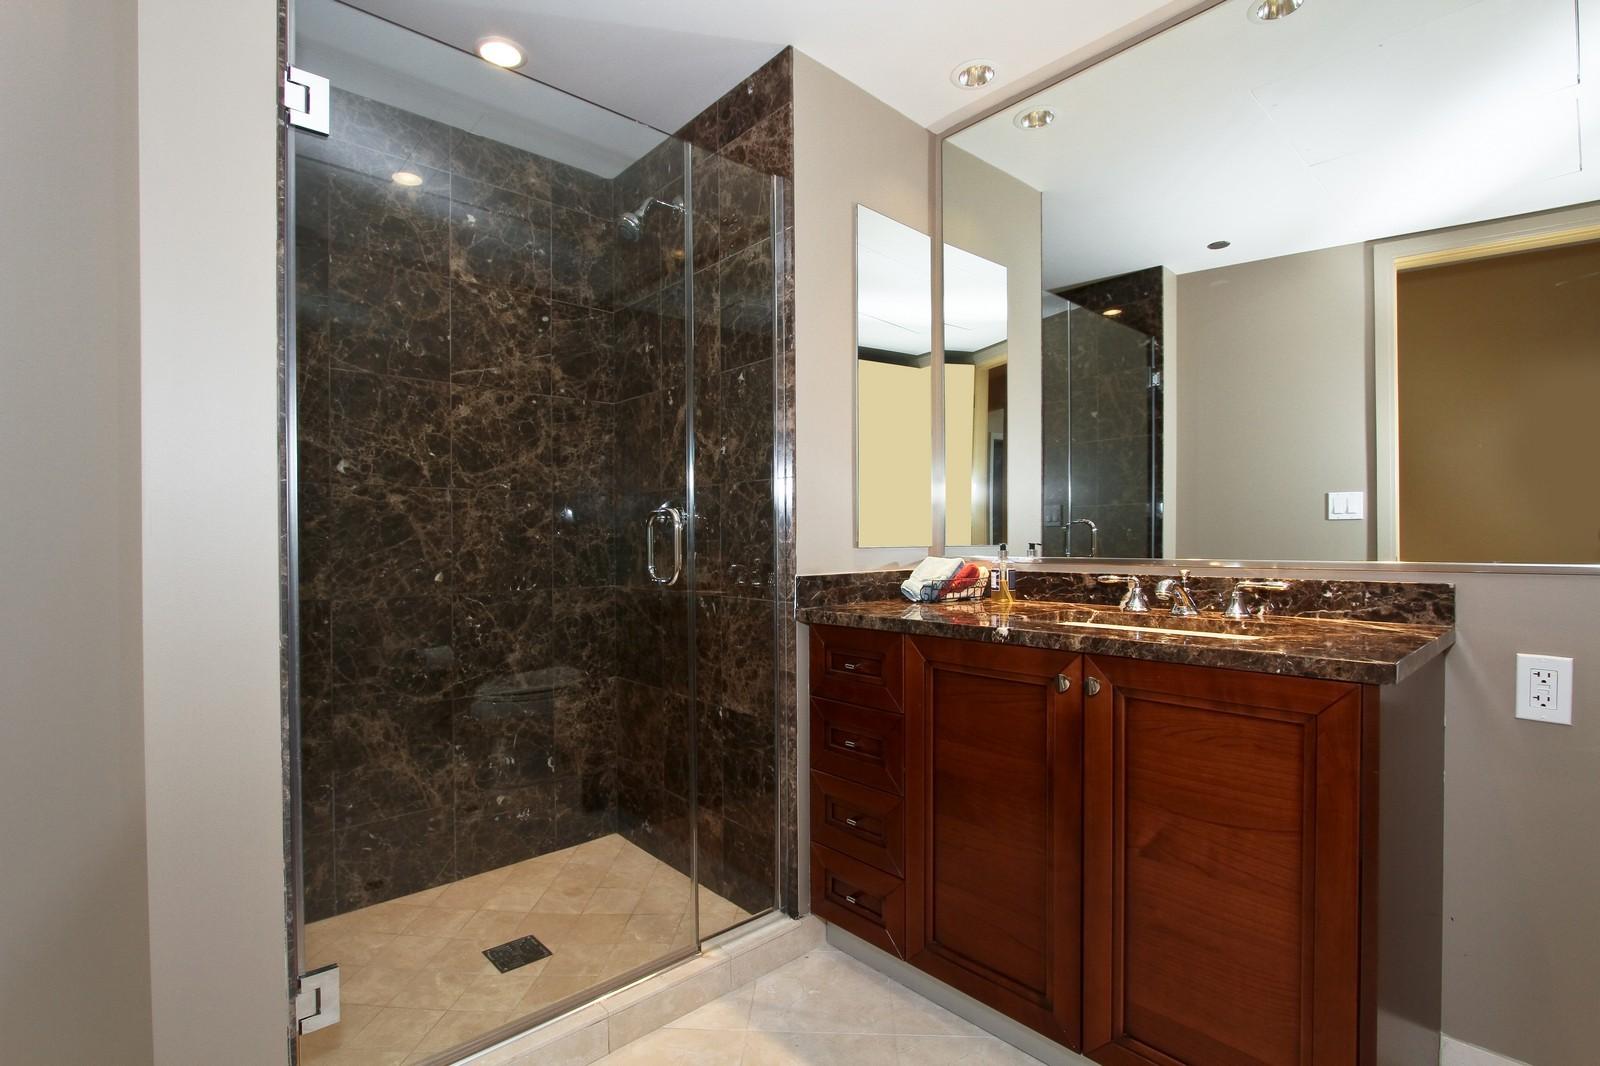 Real Estate Photography - 60 E Monroe, 6501, Chicago, IL, 60603 - Bathroom